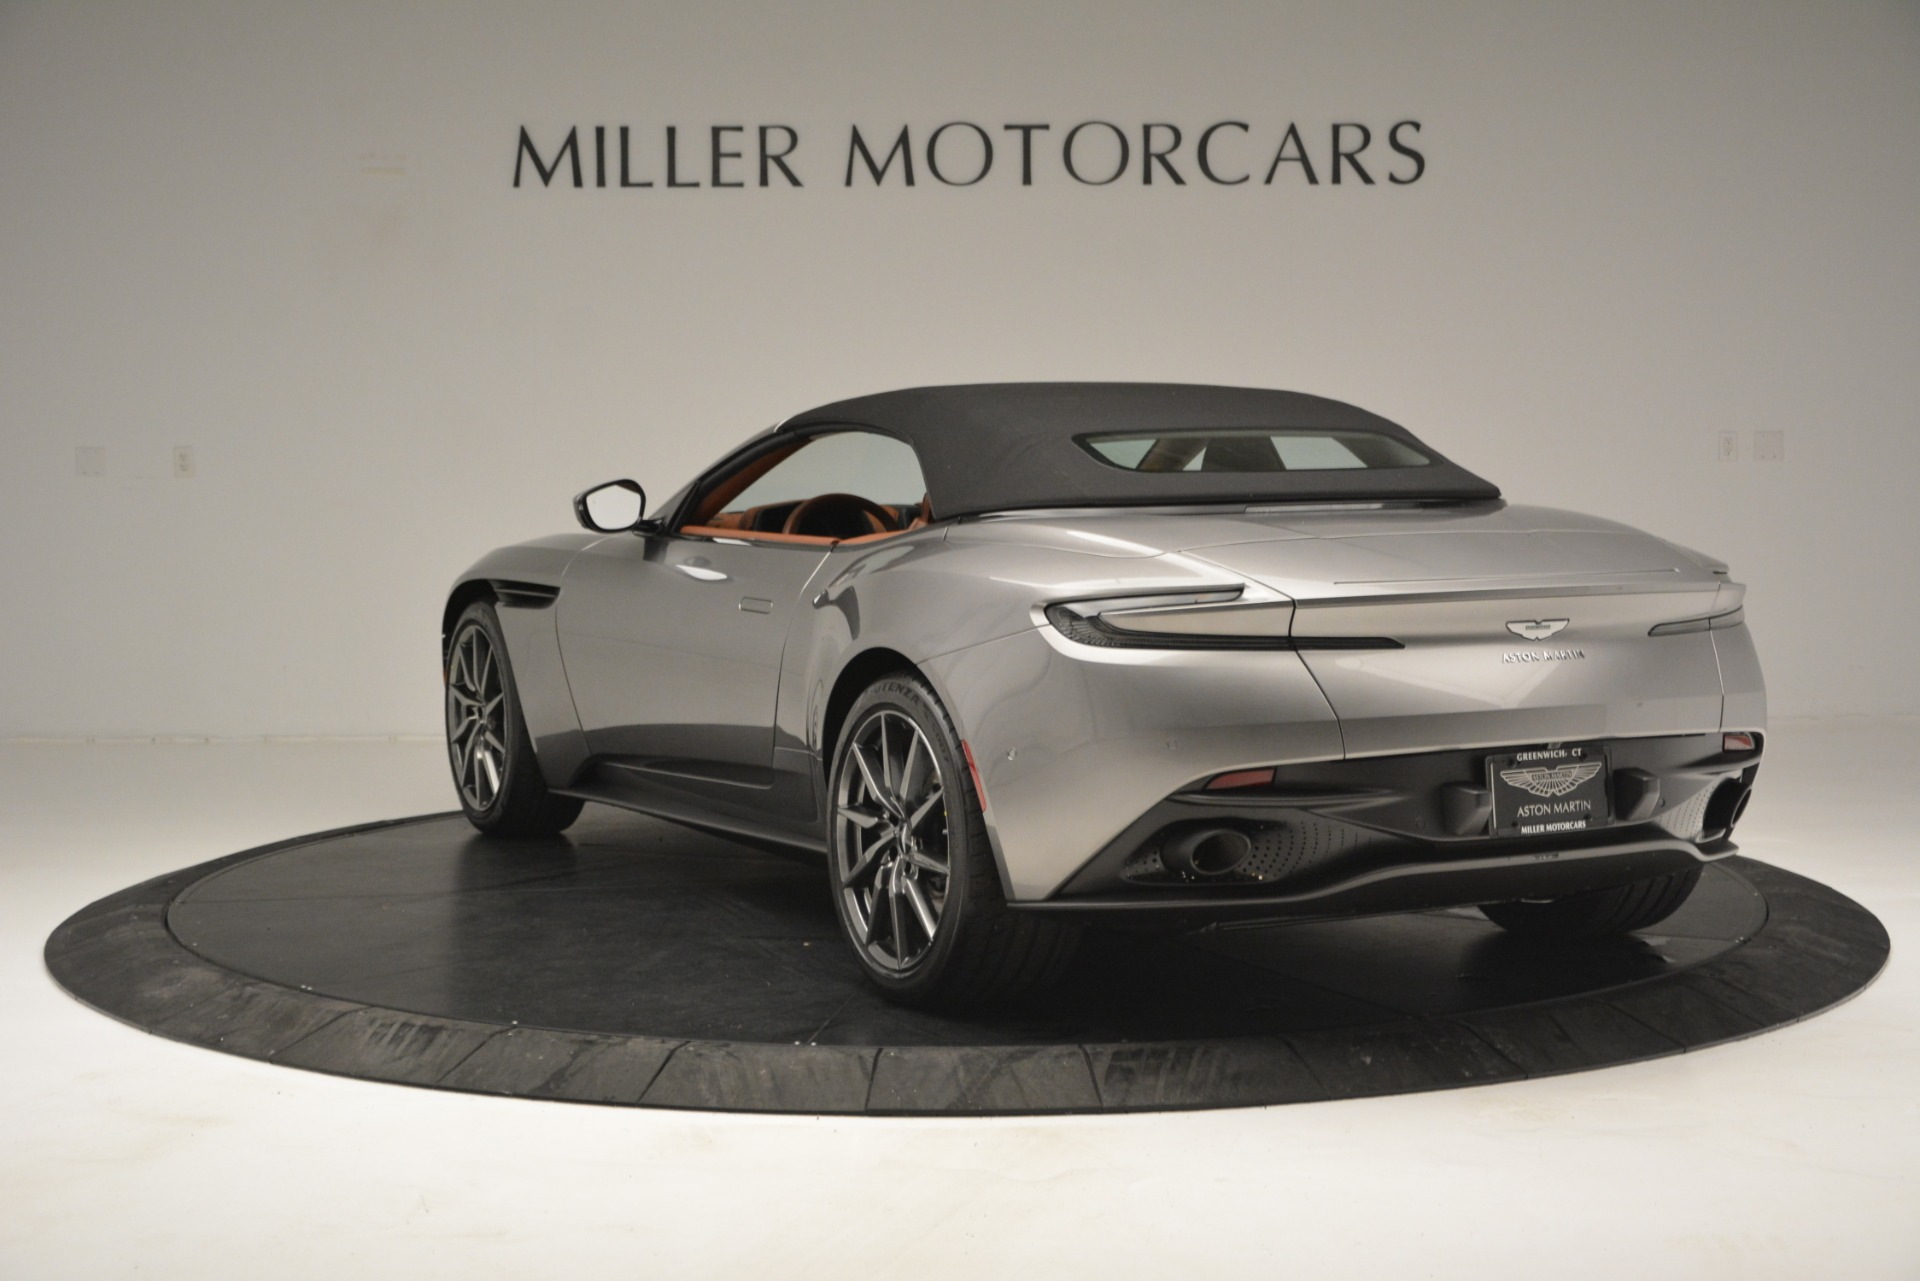 New 2019 Aston Martin DB11 V8 Convertible For Sale In Greenwich, CT. Alfa Romeo of Greenwich, A1333 3121_p16